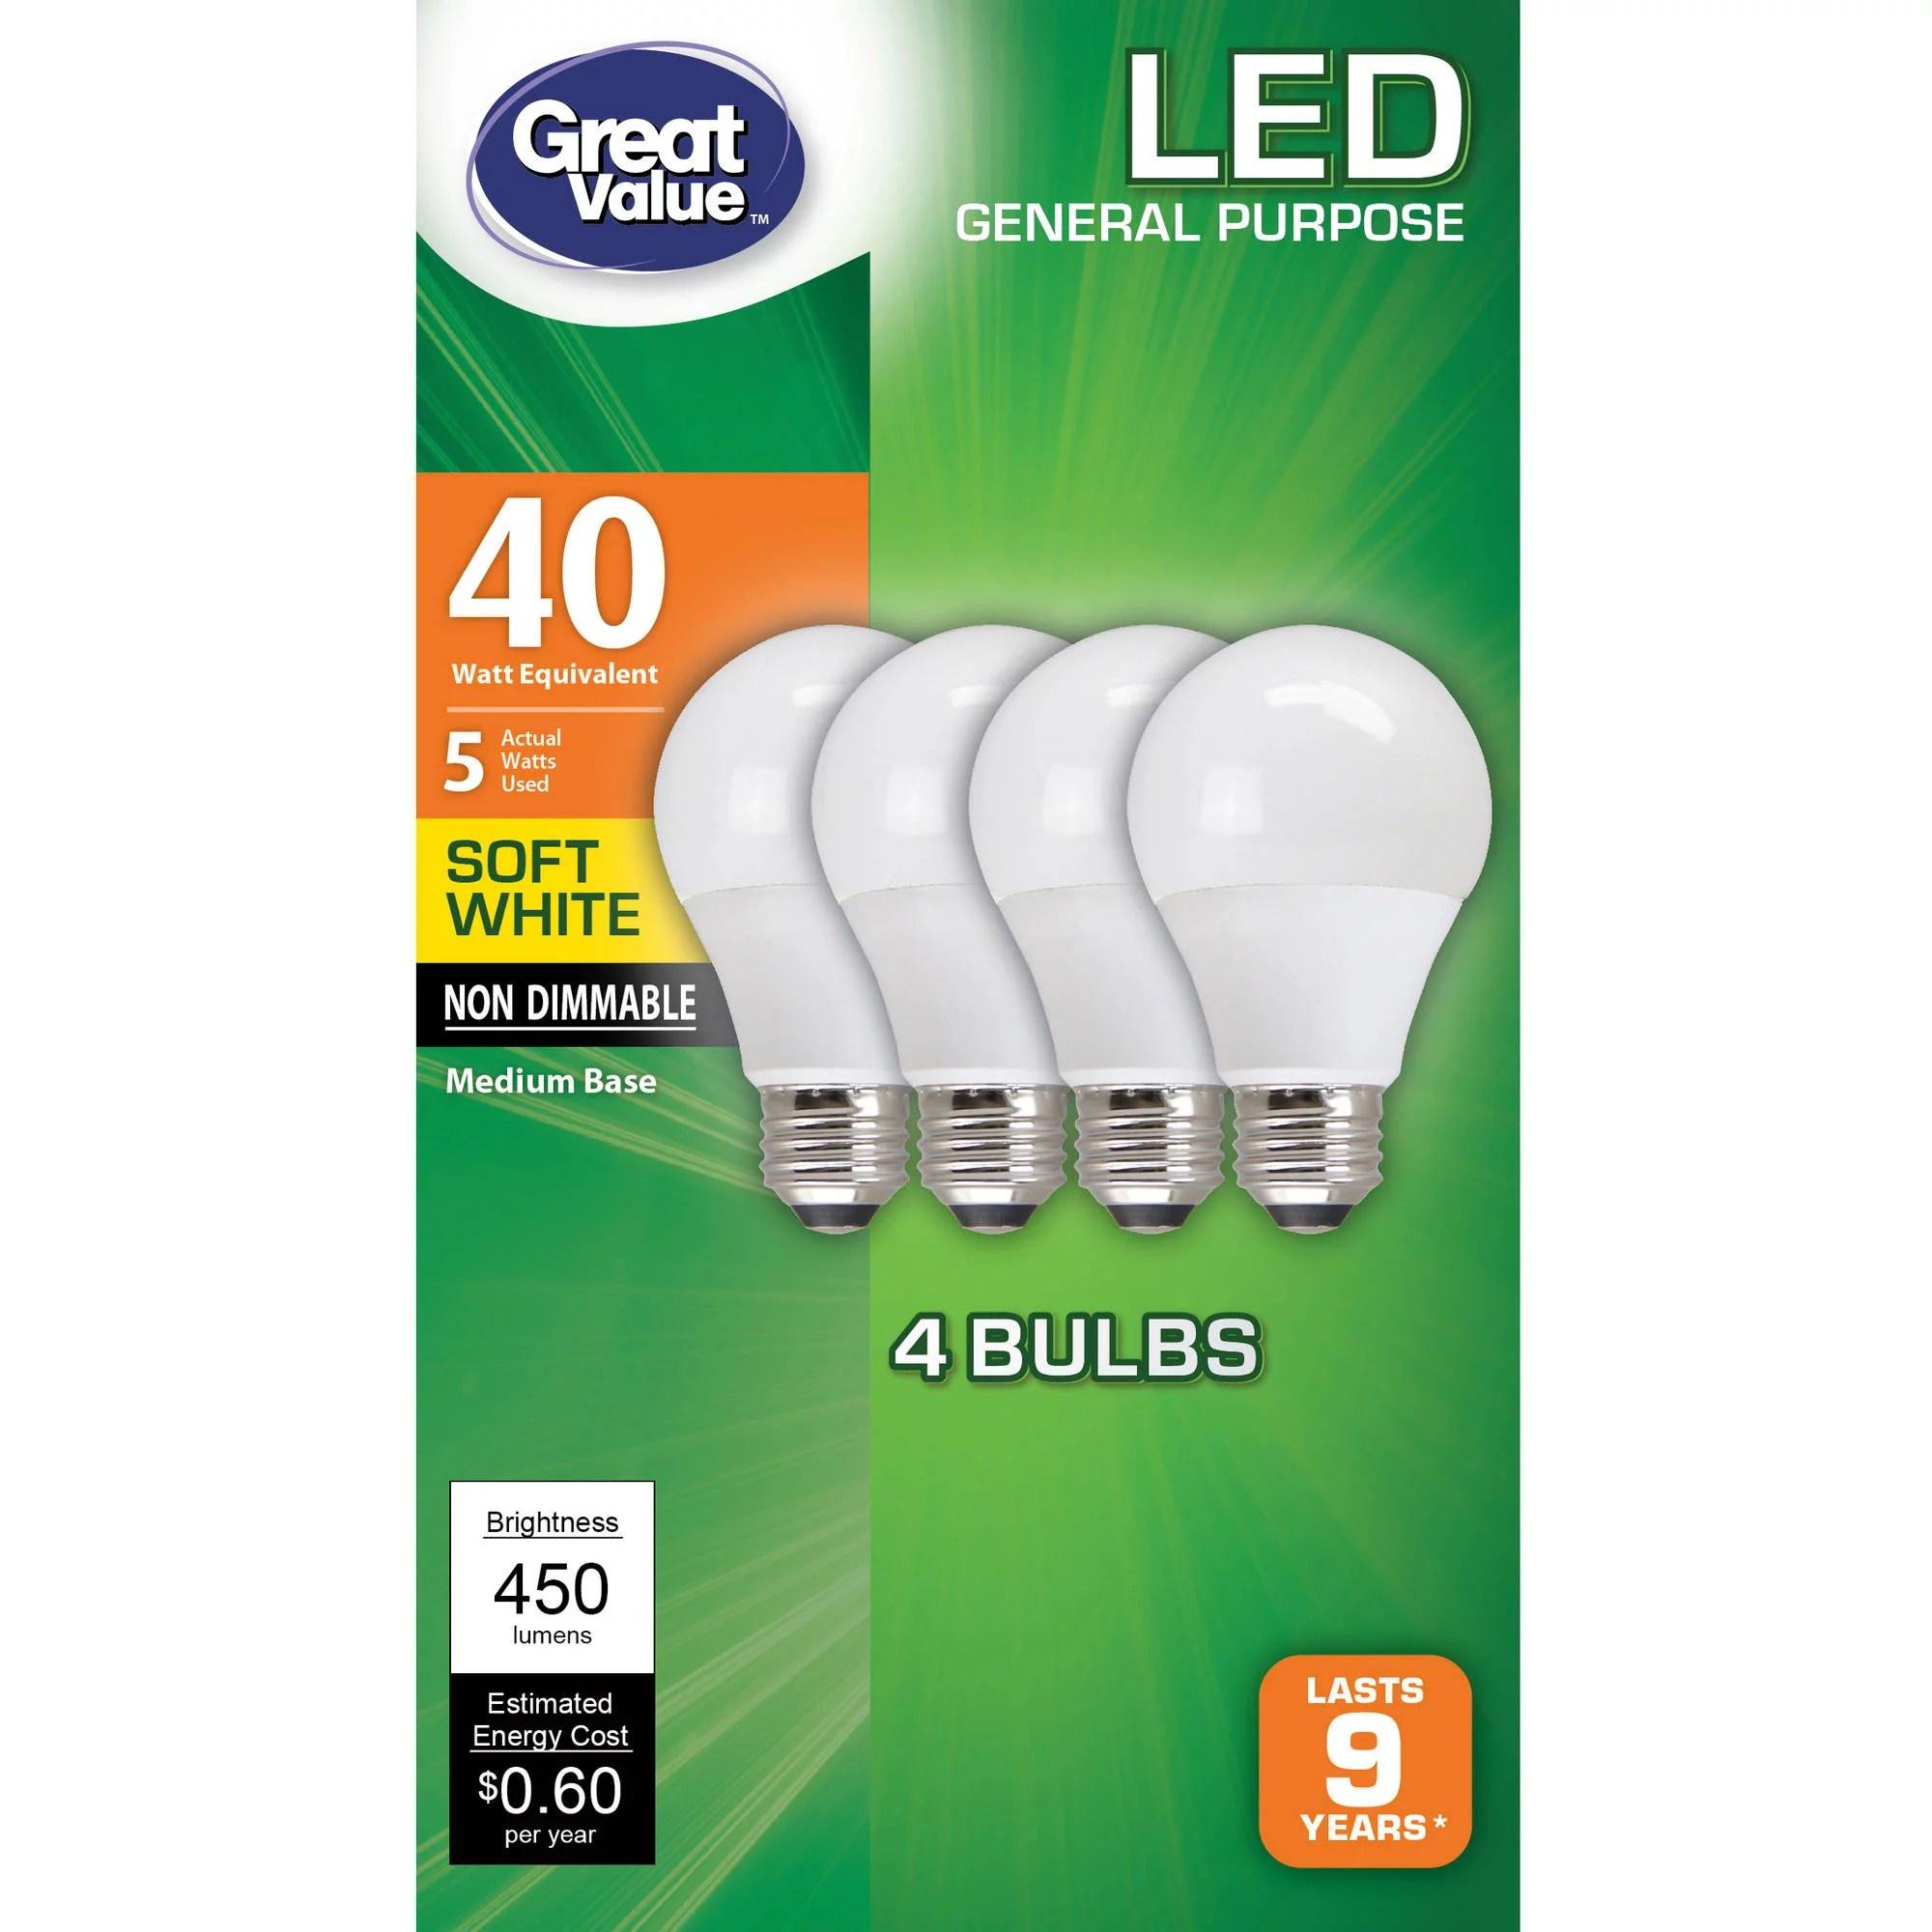 Great Value Led Light Bulbs 5w 40w Equivalent Soft